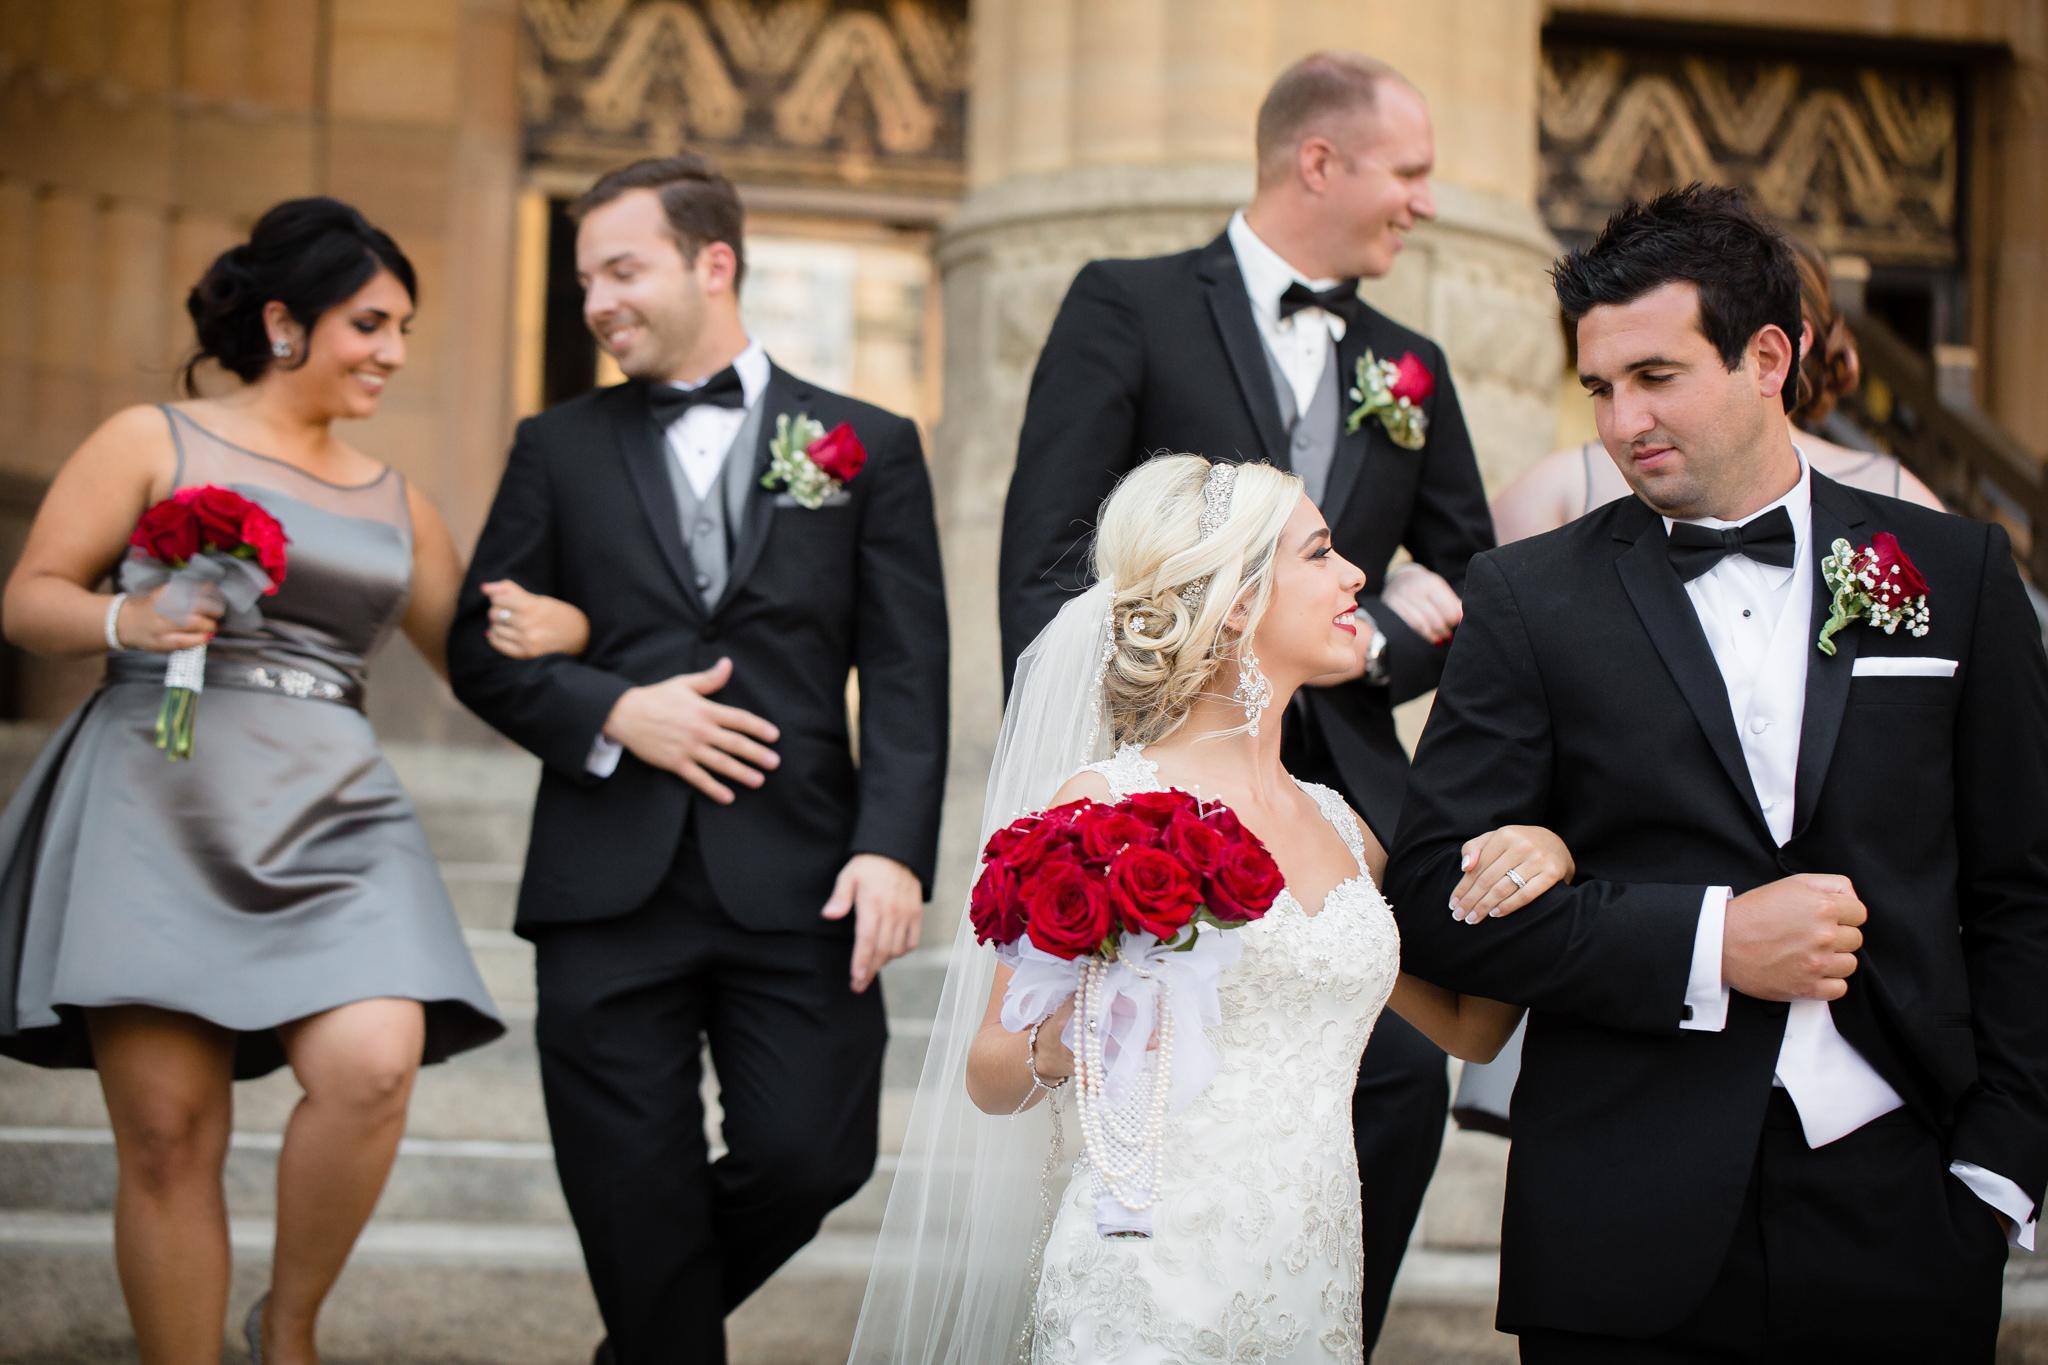 Statler-City-Buffalo-wedding-photographer- 0372.jpg